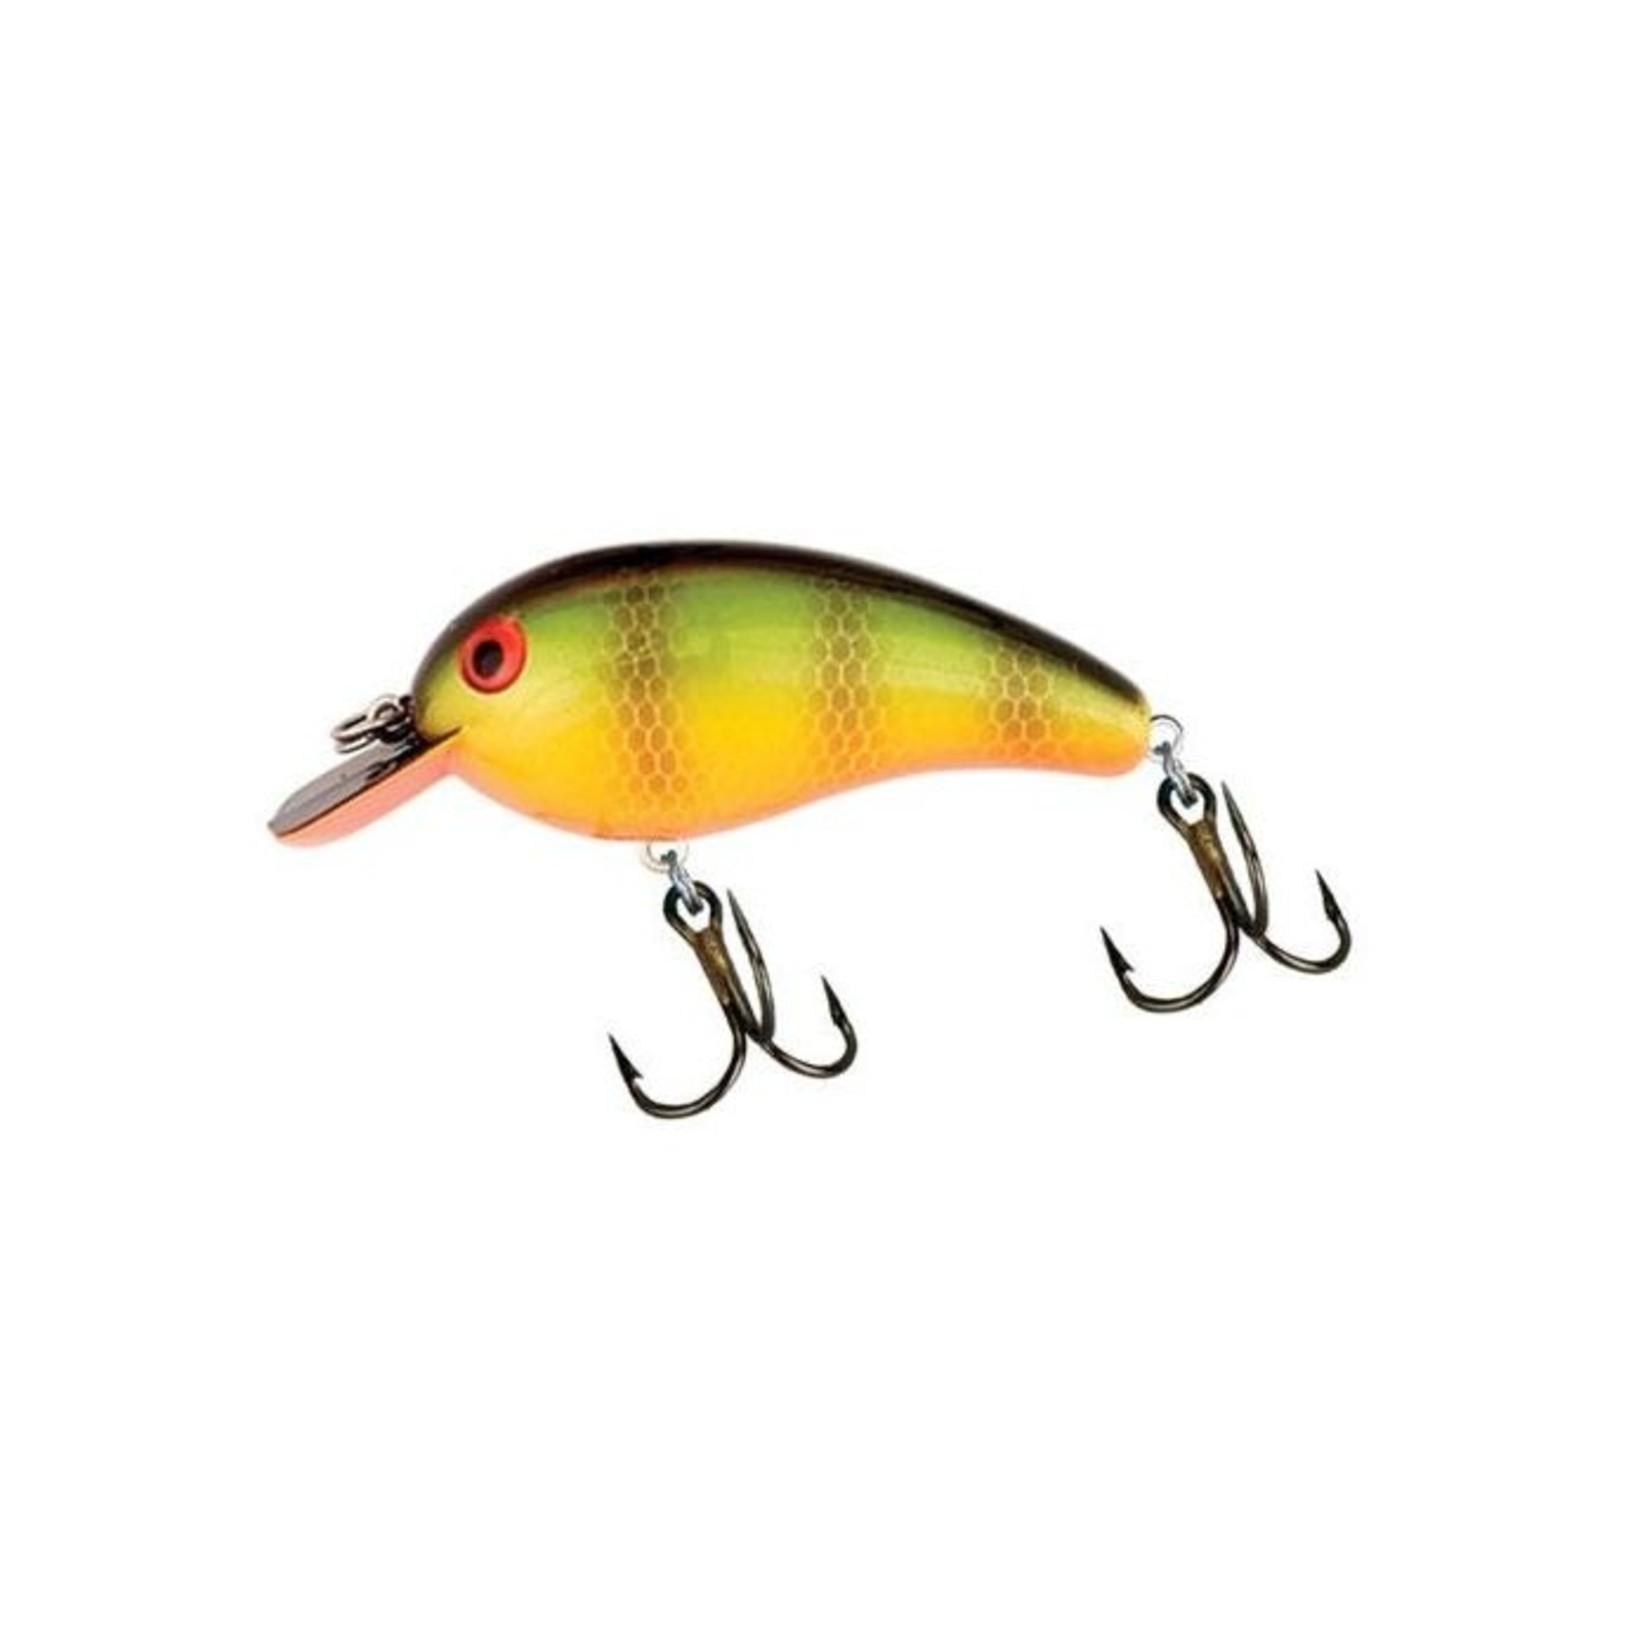 13 Fishing Cotton Cordell Big O Crankbait 77